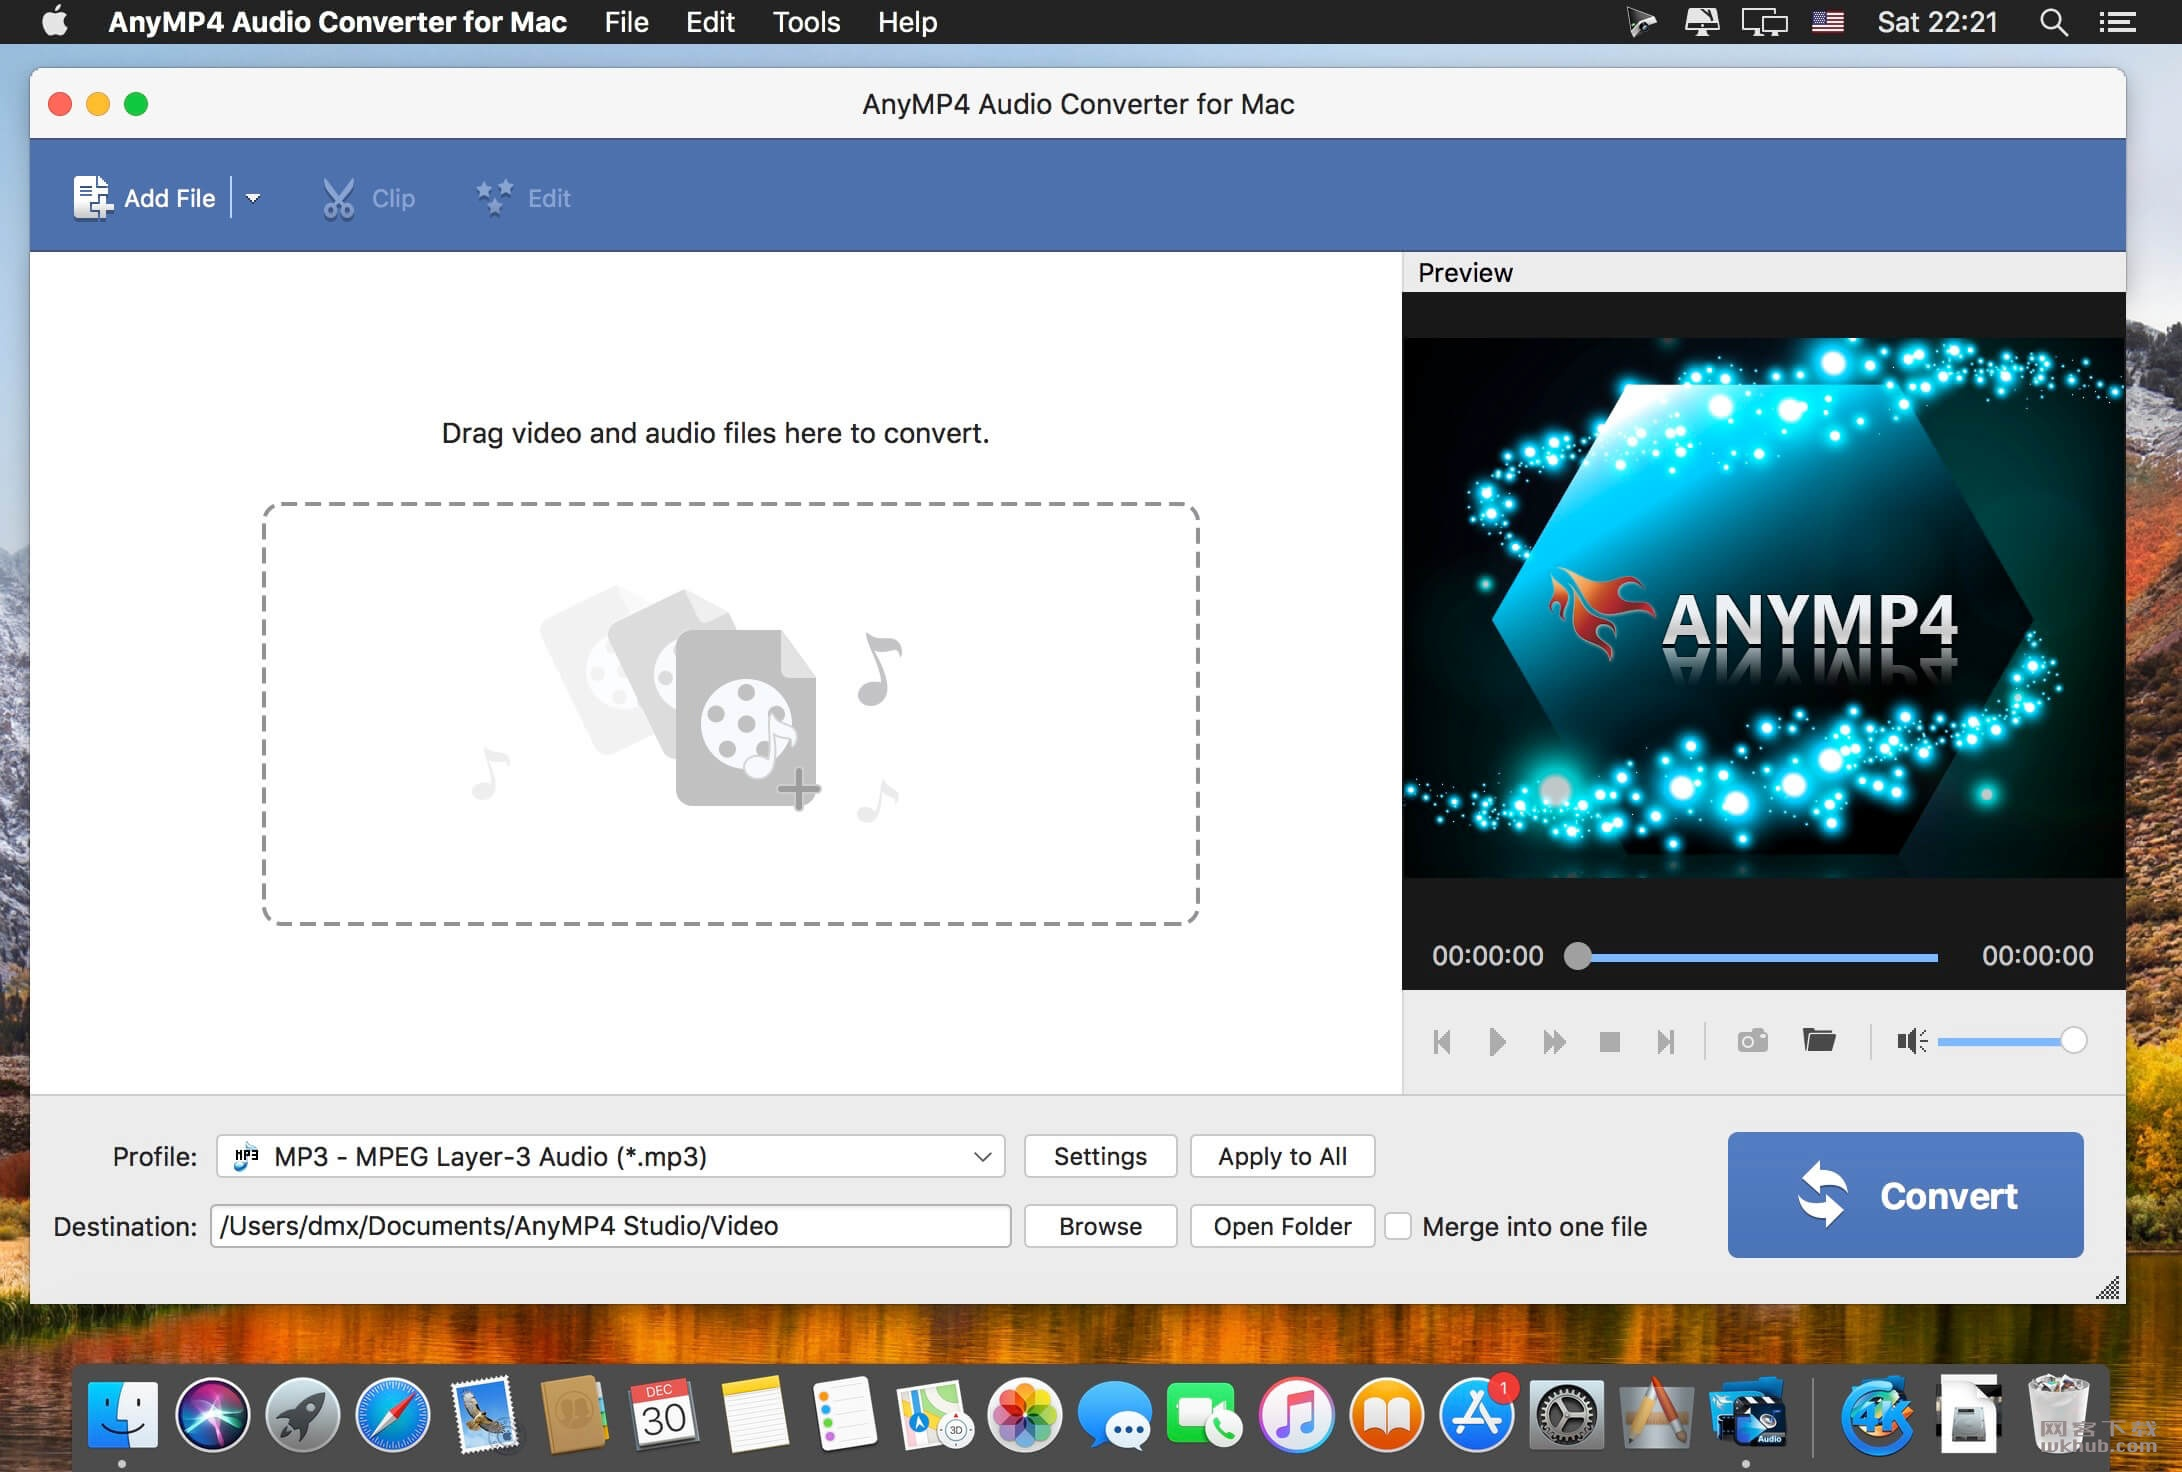 AnyMP4 Audio Converter 8.2.8.84501 强大的音频转换工具